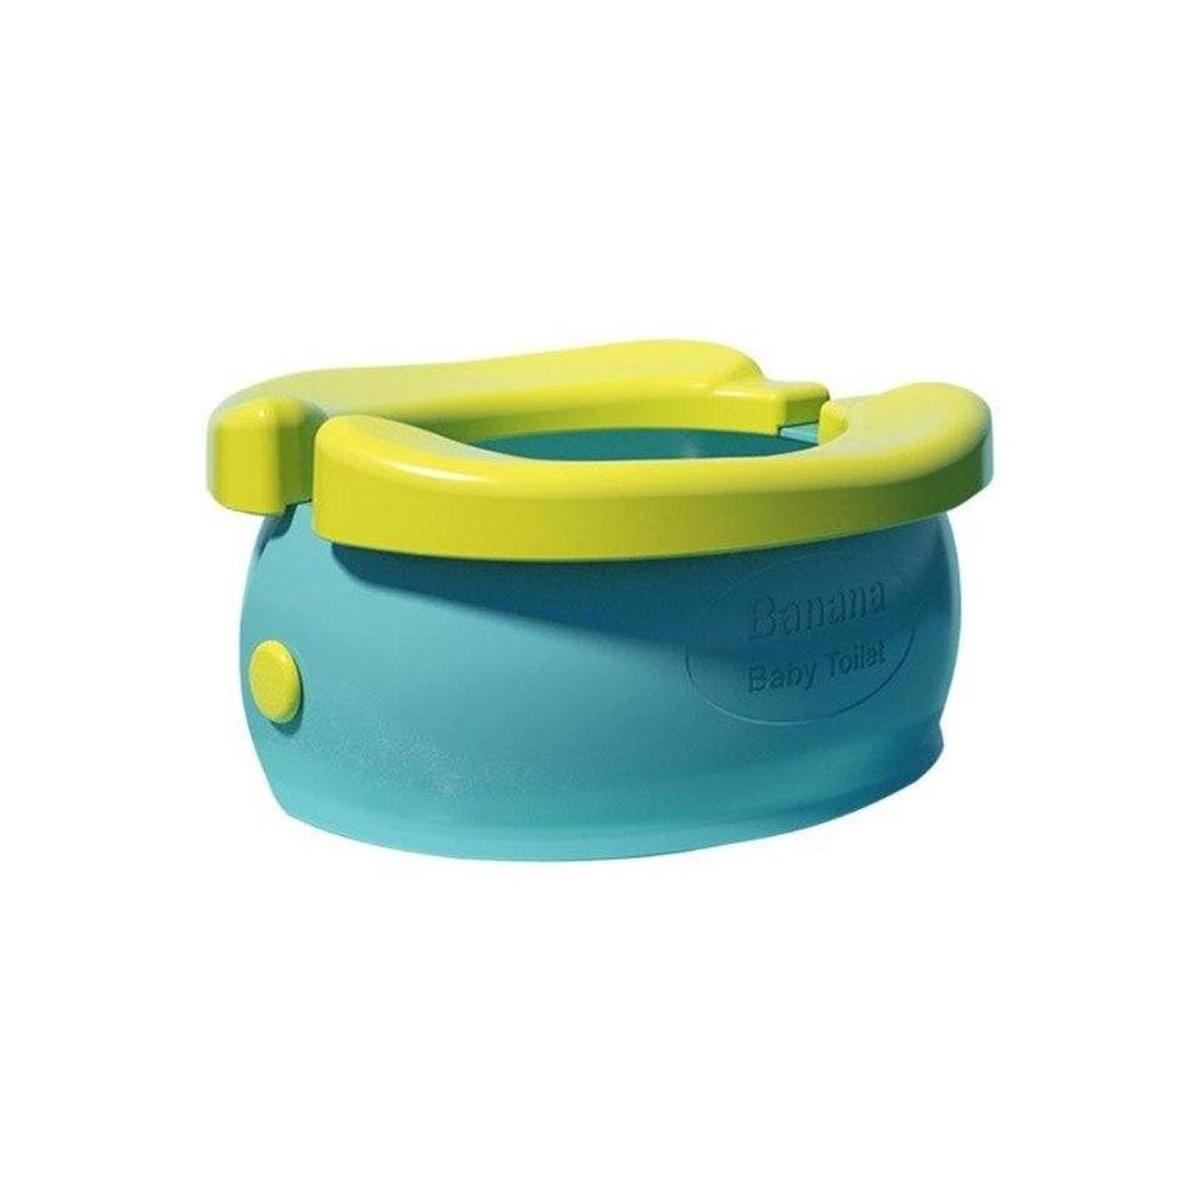 Portable Baby Potty Toilet Training Seat Folding Travel Potty Rings Banana Pattern Training Toilet